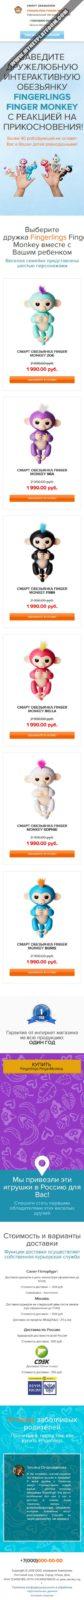 Скриншот готового лендинга FingerLings Finger Monkey - робот-обезьянка 001 - моб